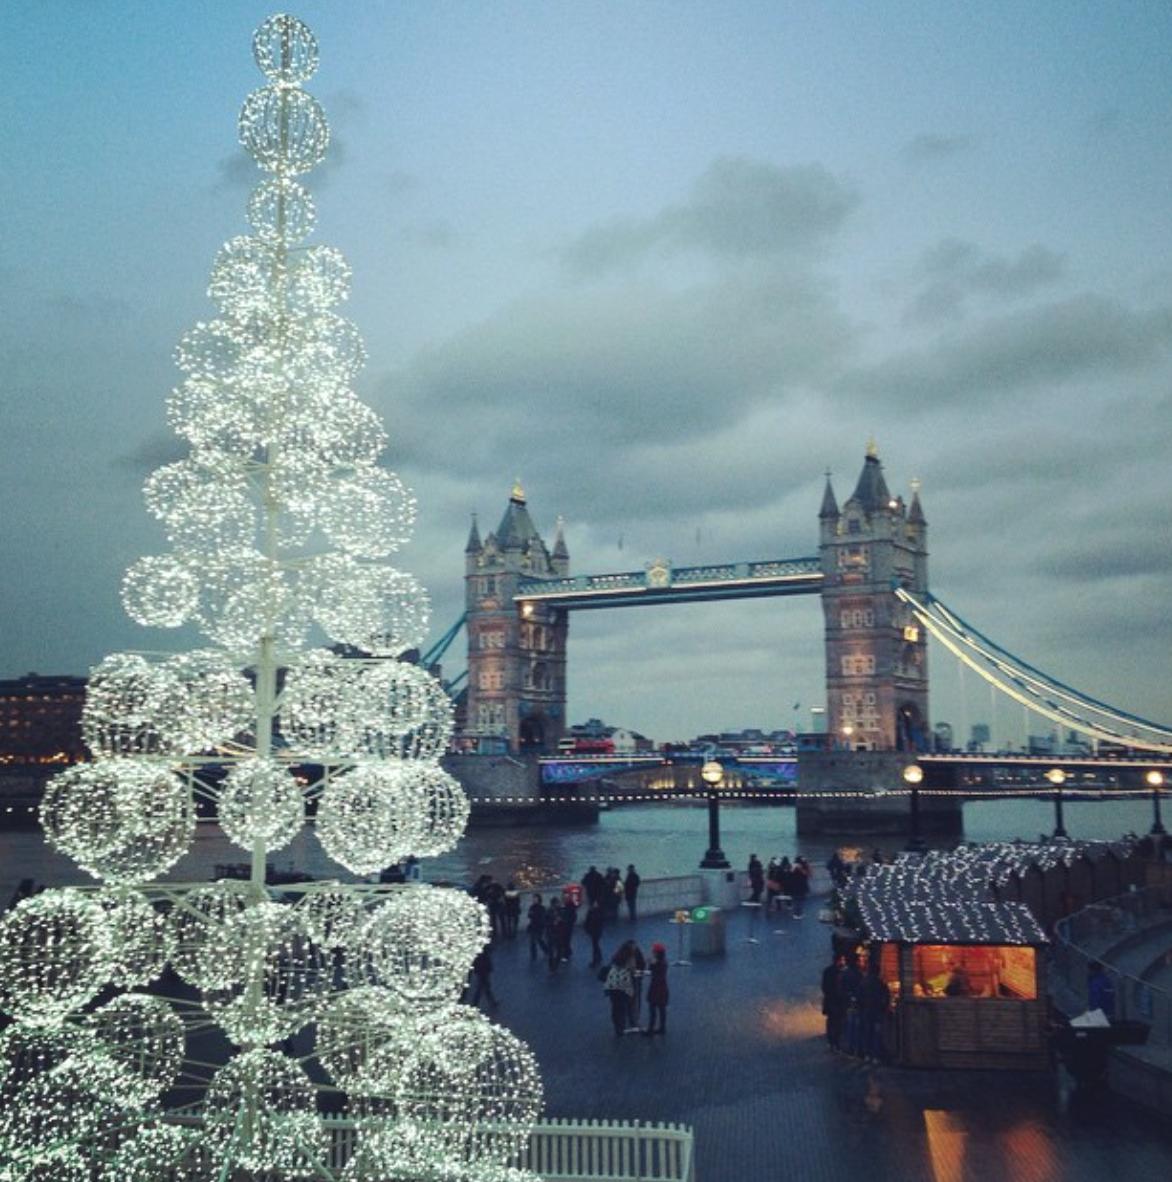 large LED ball motif christmas tree near tower bridge